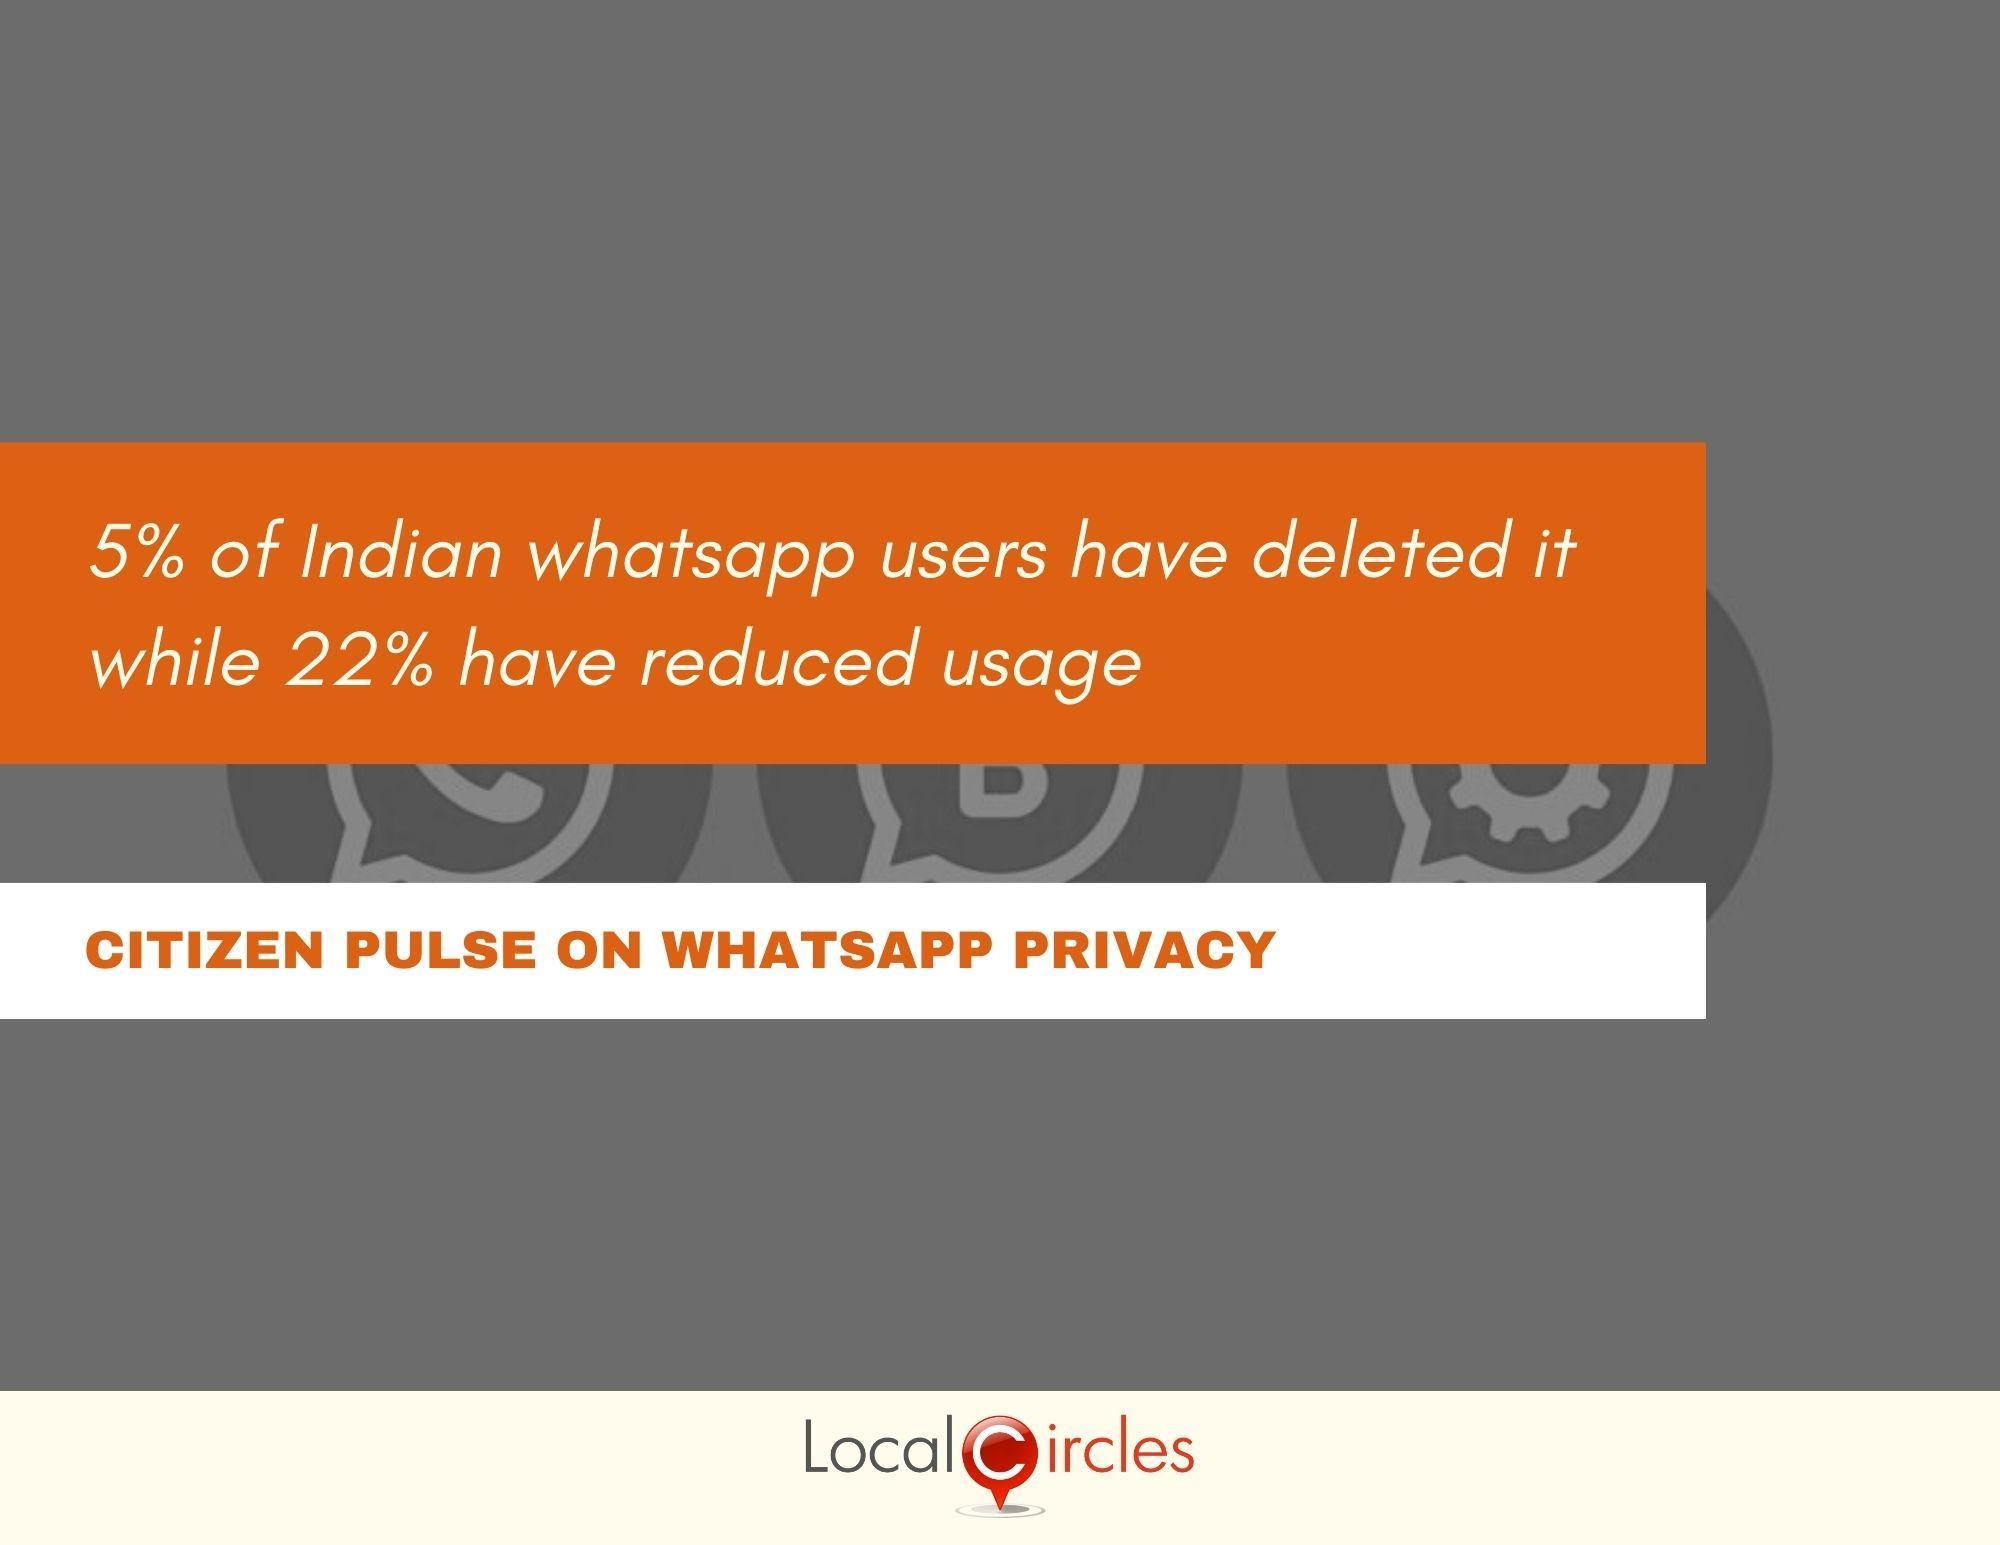 via_LocalCircles_Whatsapp_Privacy_4___20210129121402___.jpg